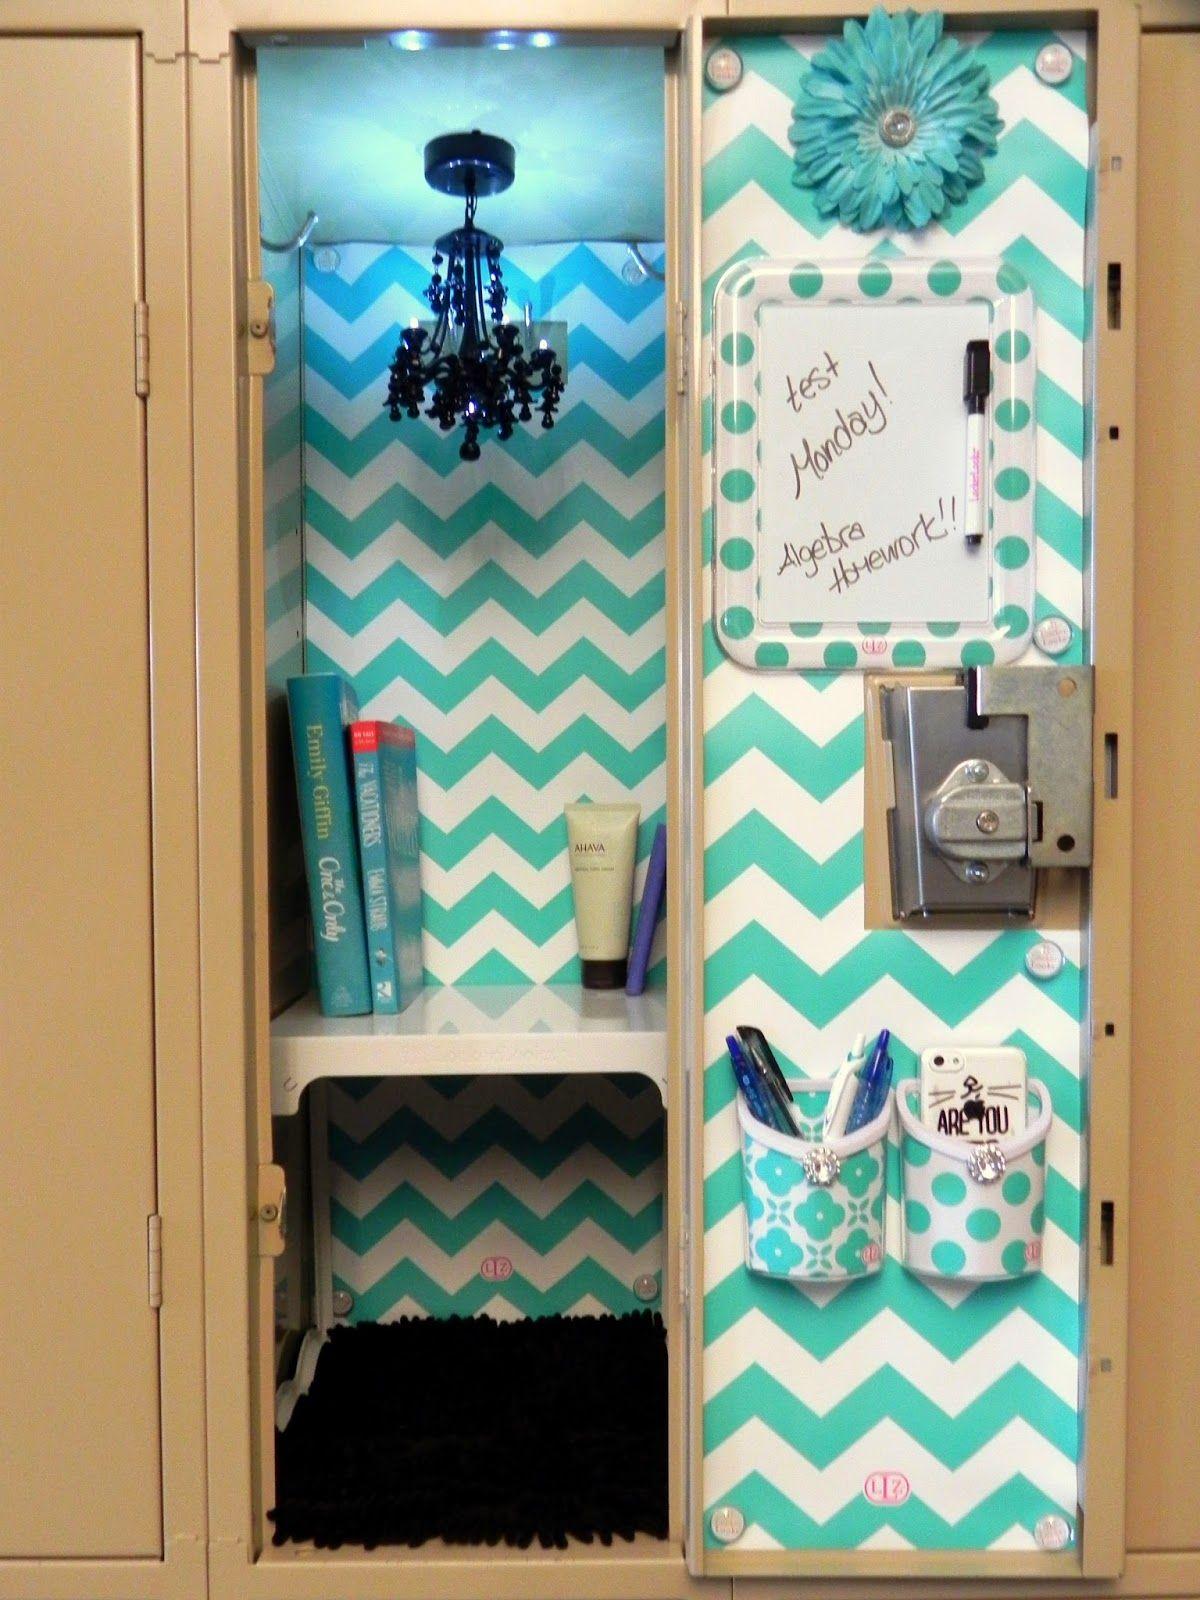 Decor School Locker Decorations With Images Of Locker Decorations